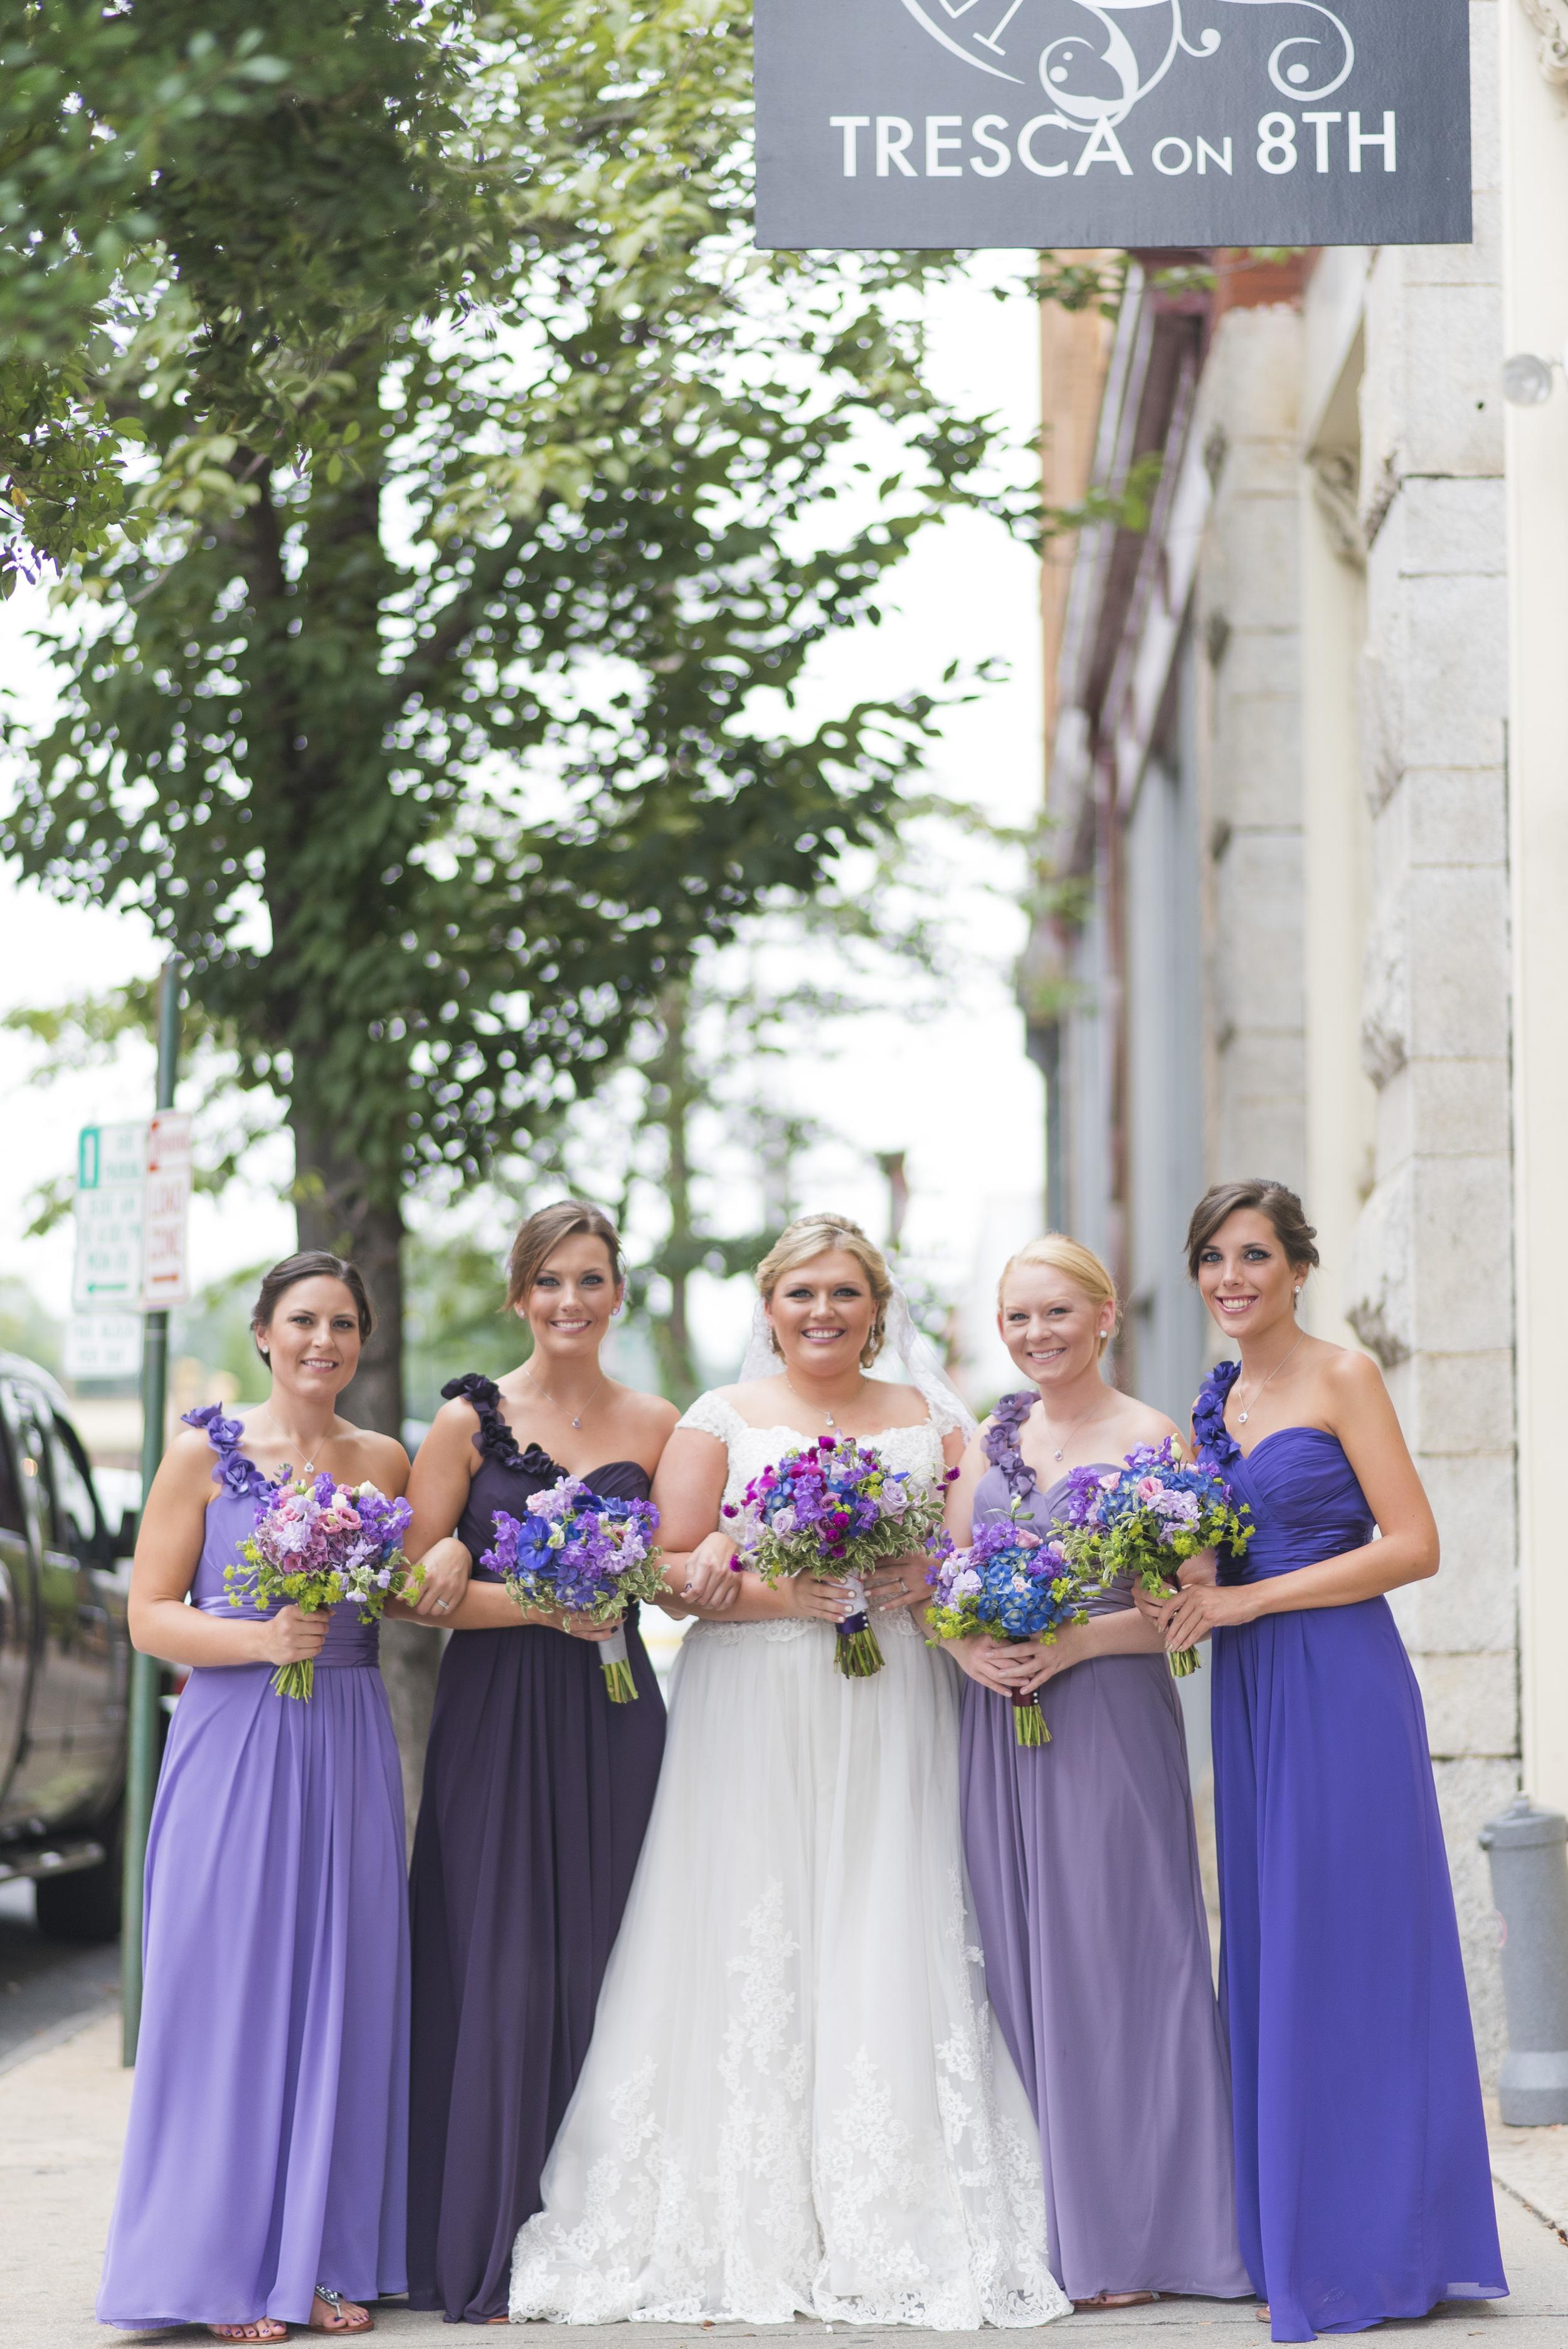 Lynchburg_VA_Wedding_Tresca on 8th_Downtown_Purple_elegant_Photos873.jpg